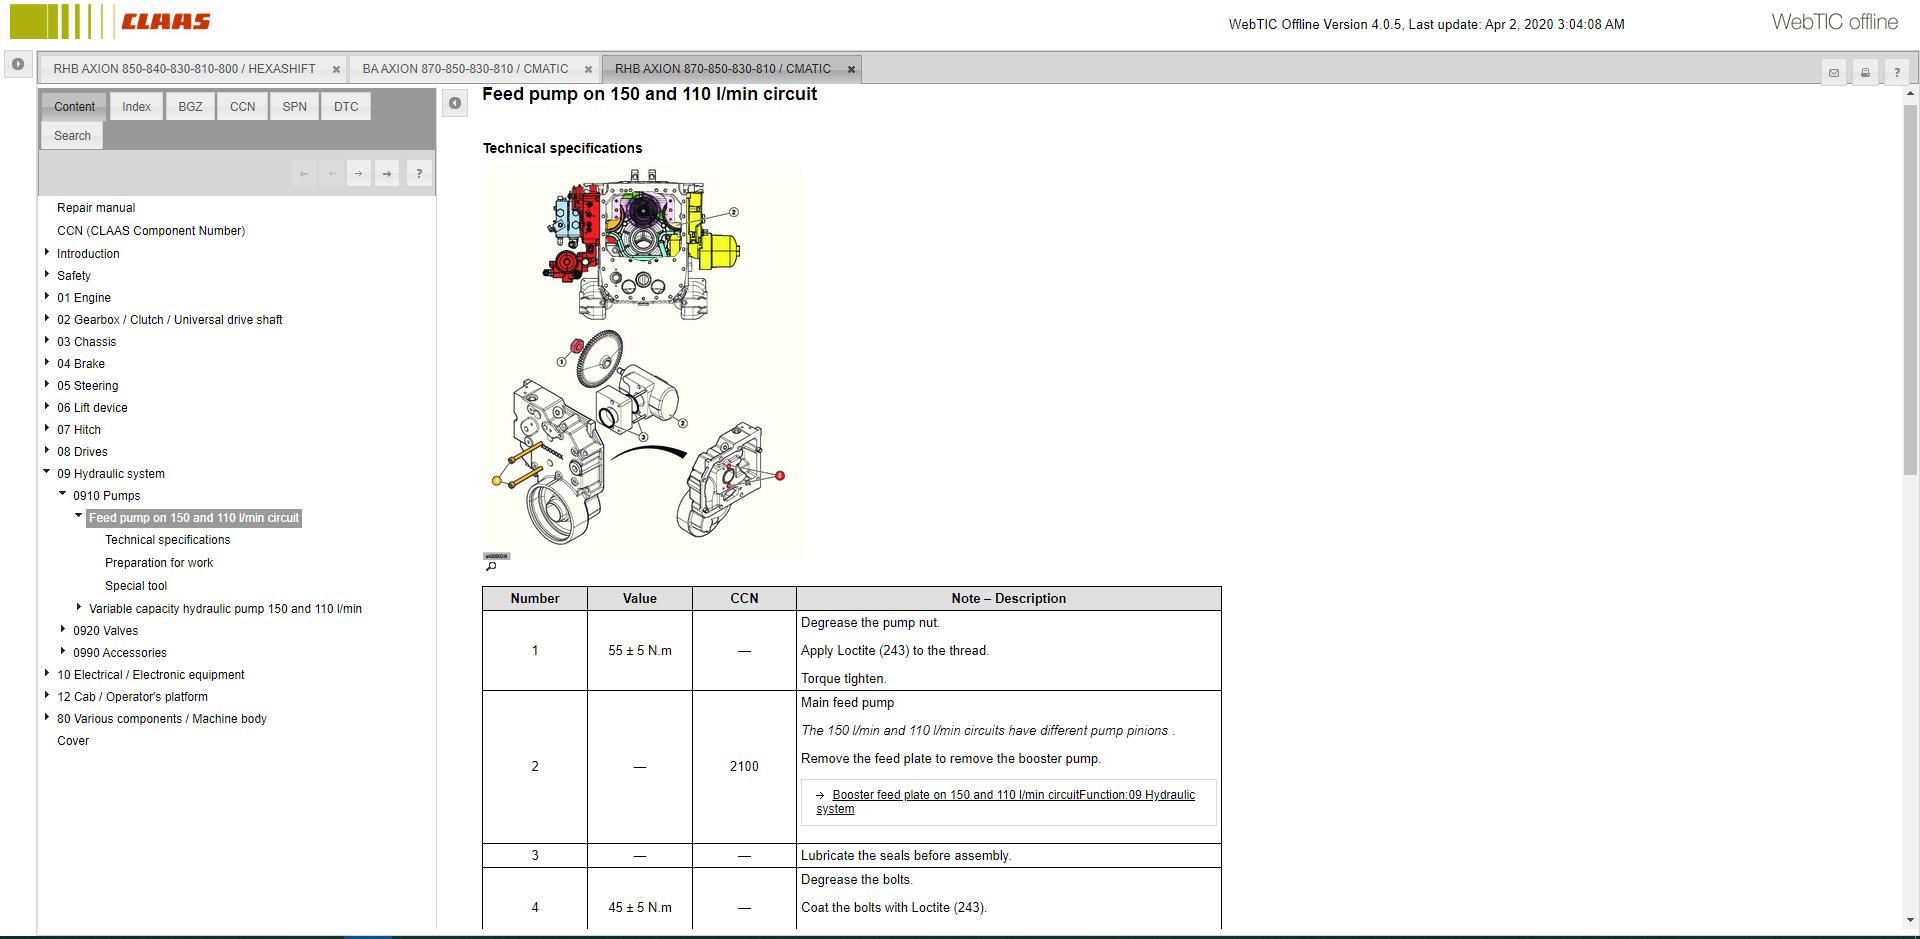 CLAASWebTICOffline2020RepairandServiceDocumentation4